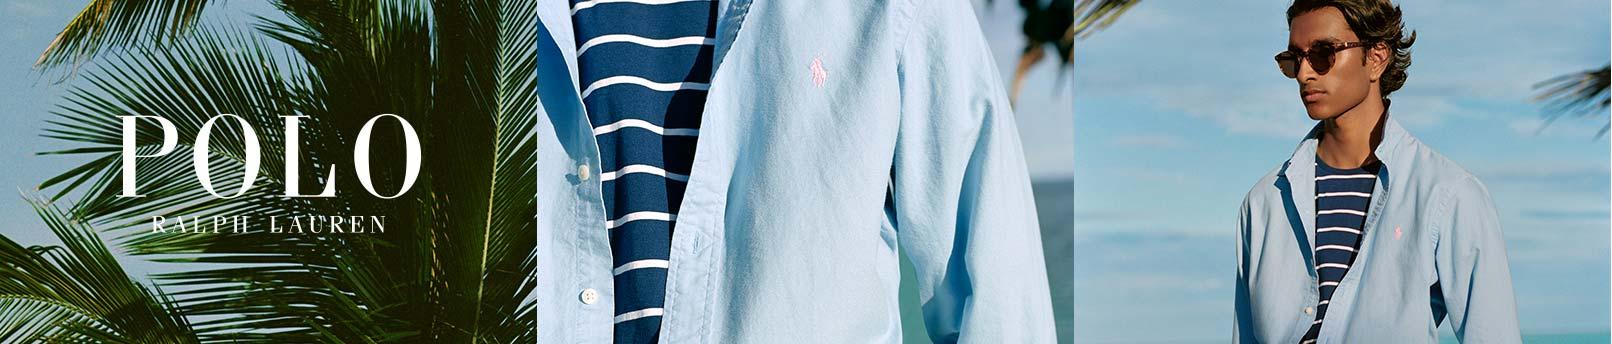 Polo Ralph Lauren shoppen